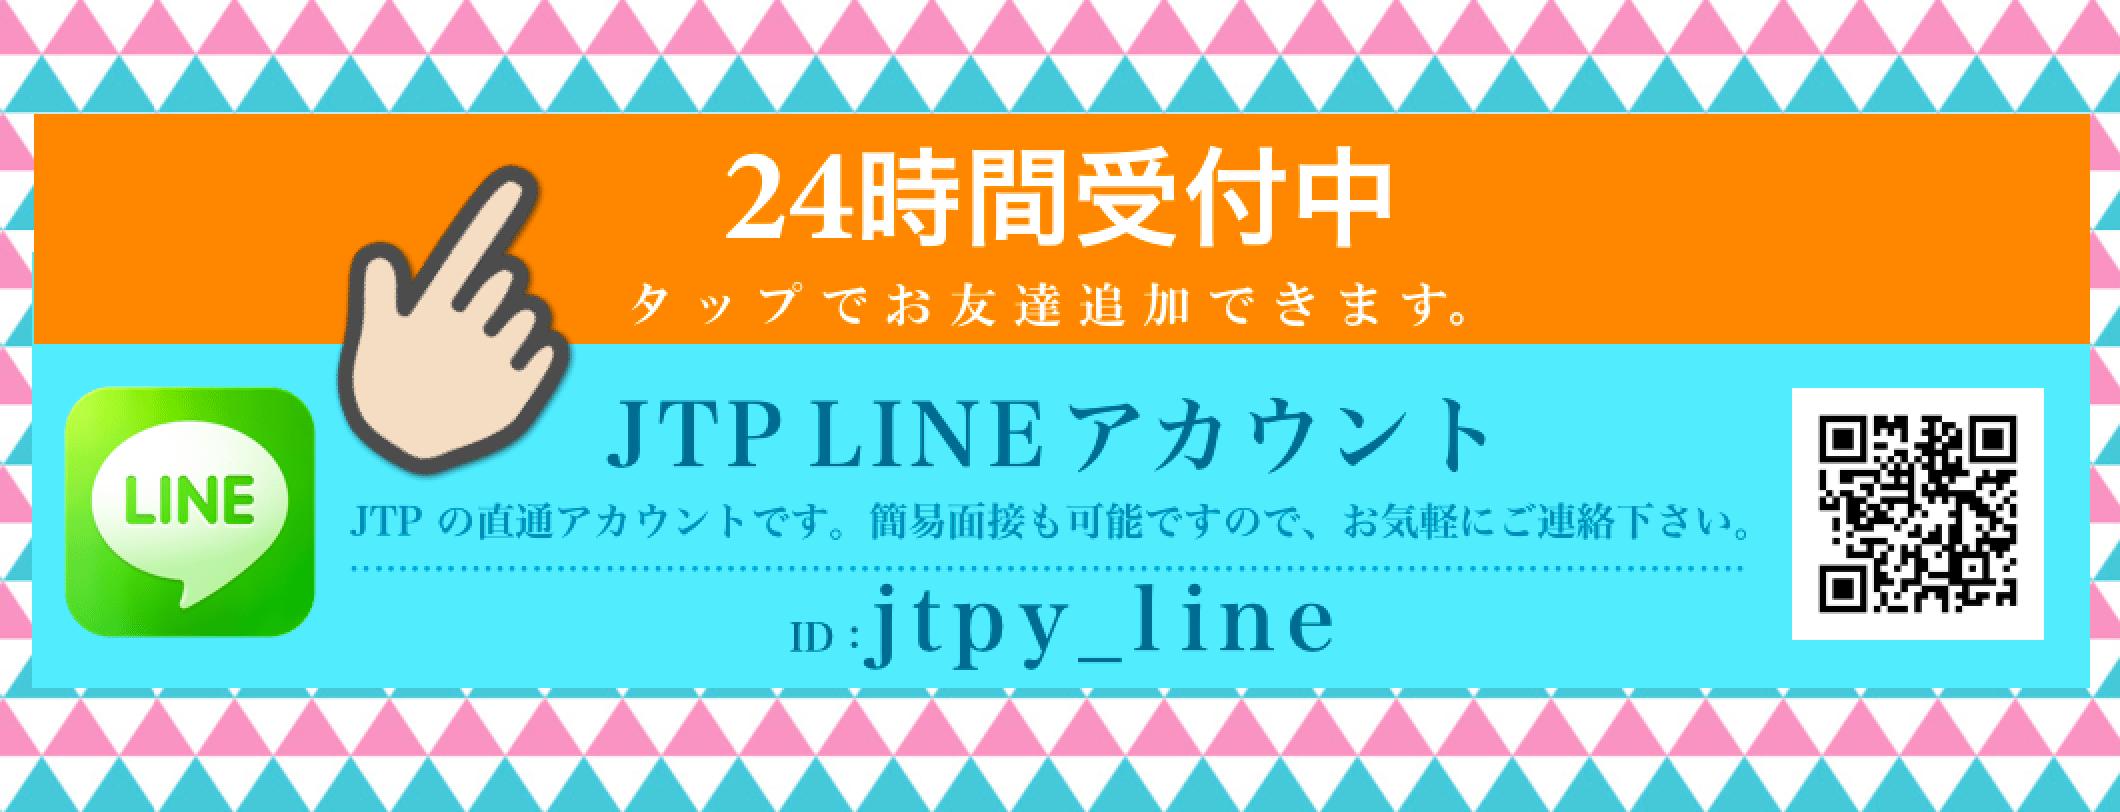 24hline_click2